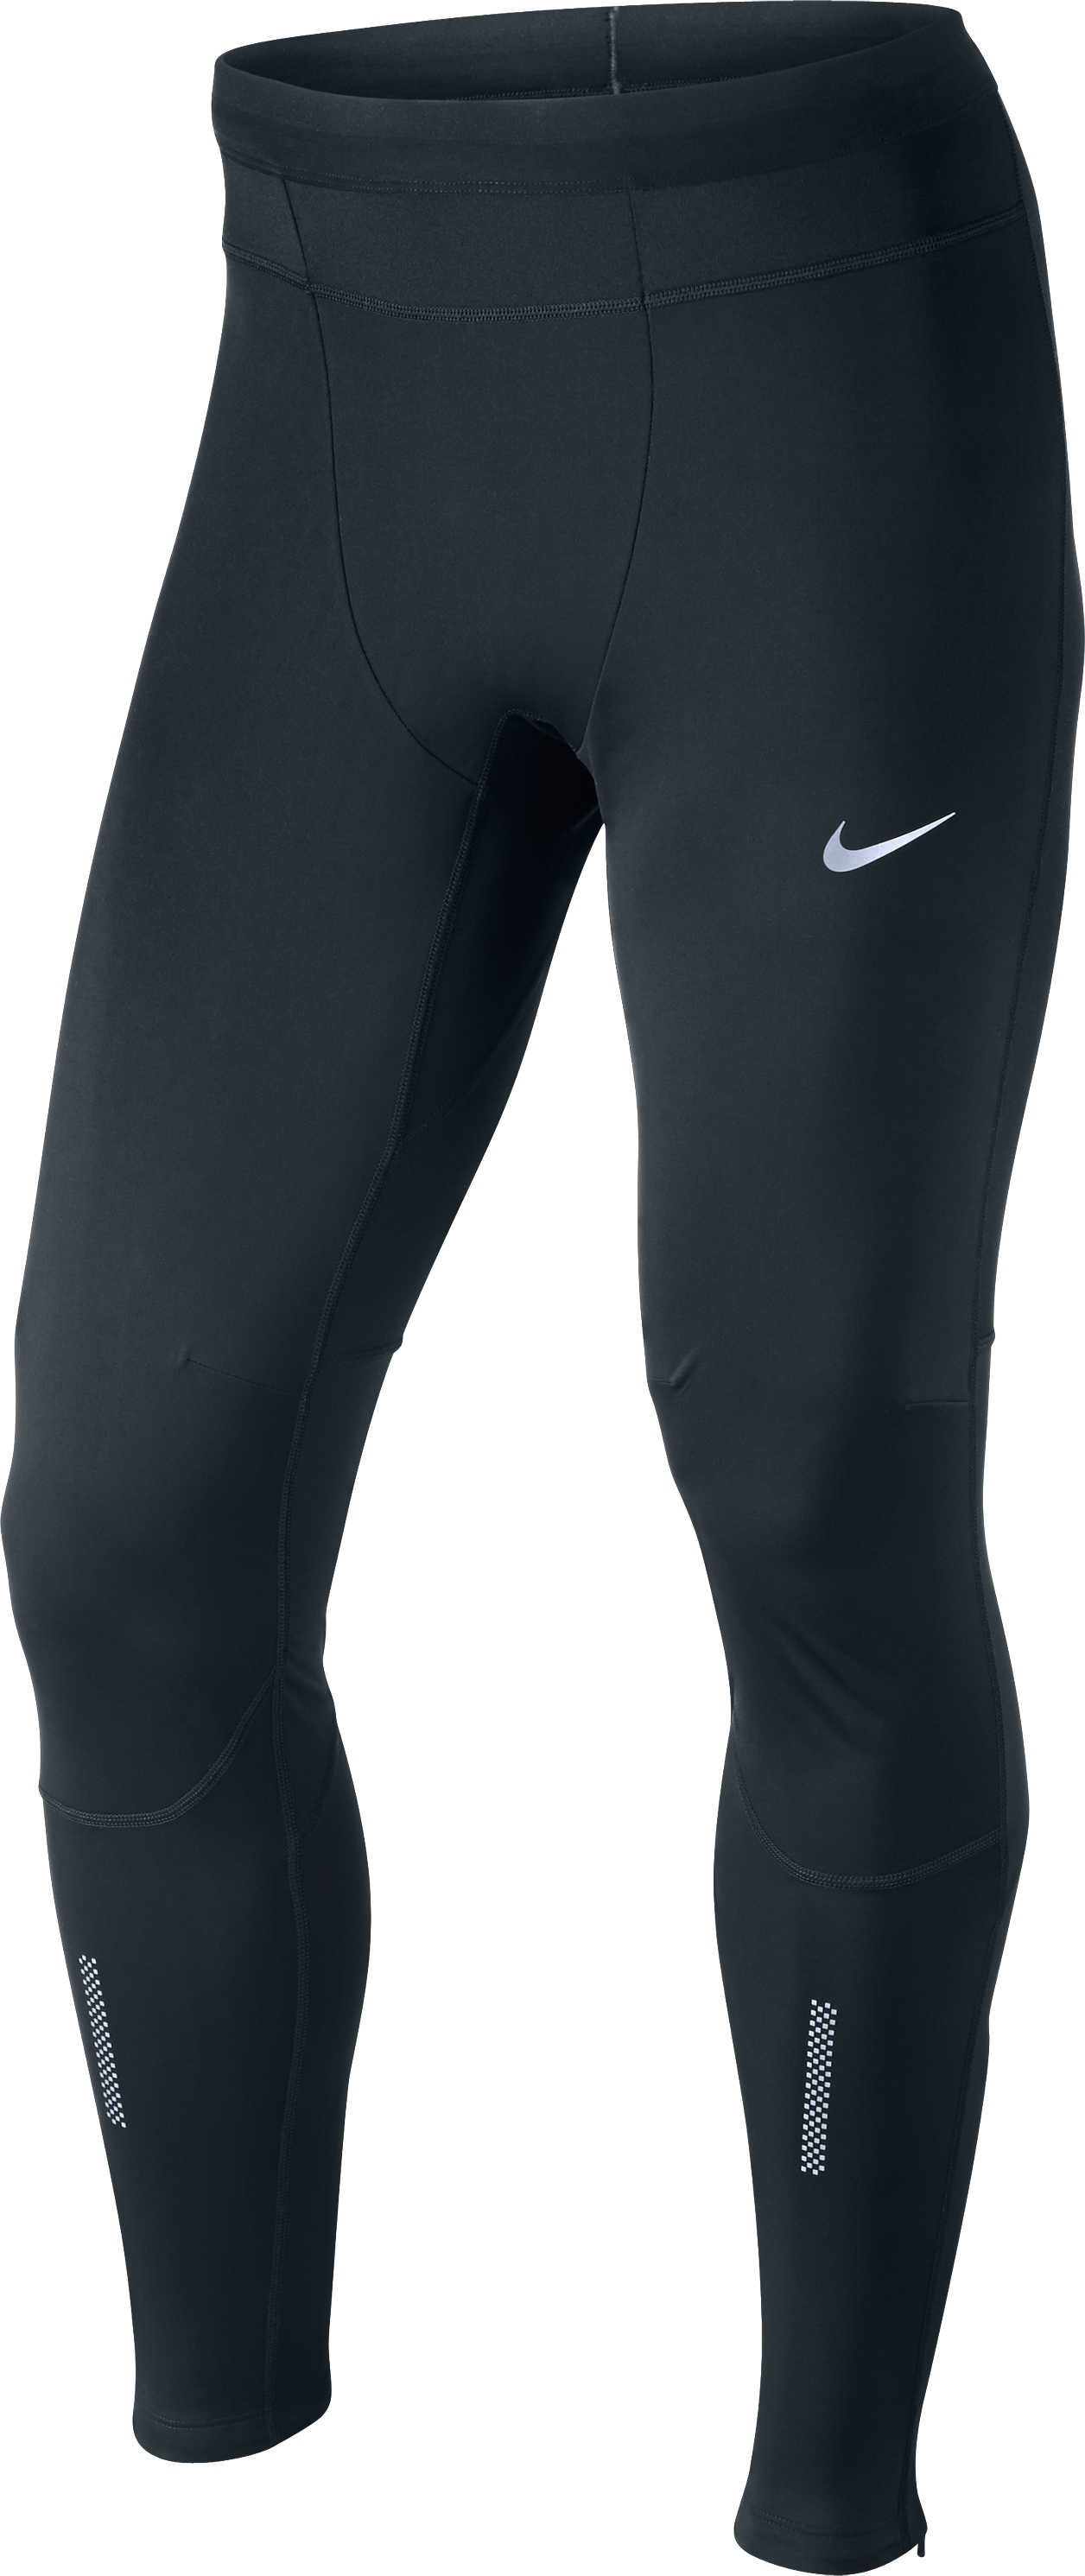 1790006baed2 Nike Dri Fit Shield Pant